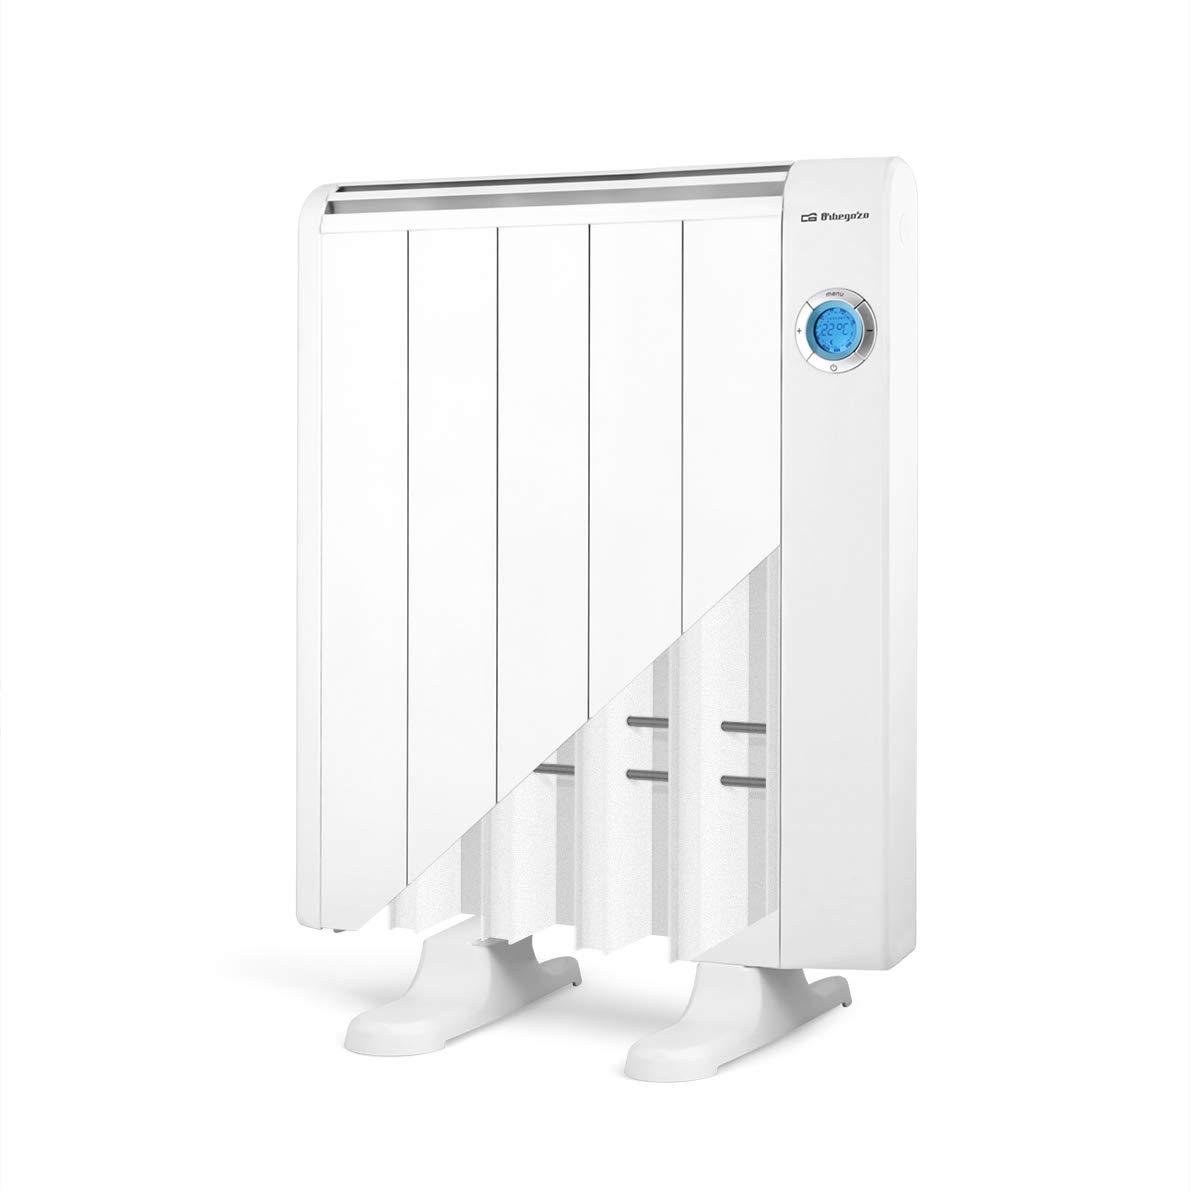 7 Elementos de Calor Aluminio Pantalla Digital LCD 1300 W Mando a Distancia Orbegozo Rre 1310 Emisor T/érmico Bajo Consumo Blanco